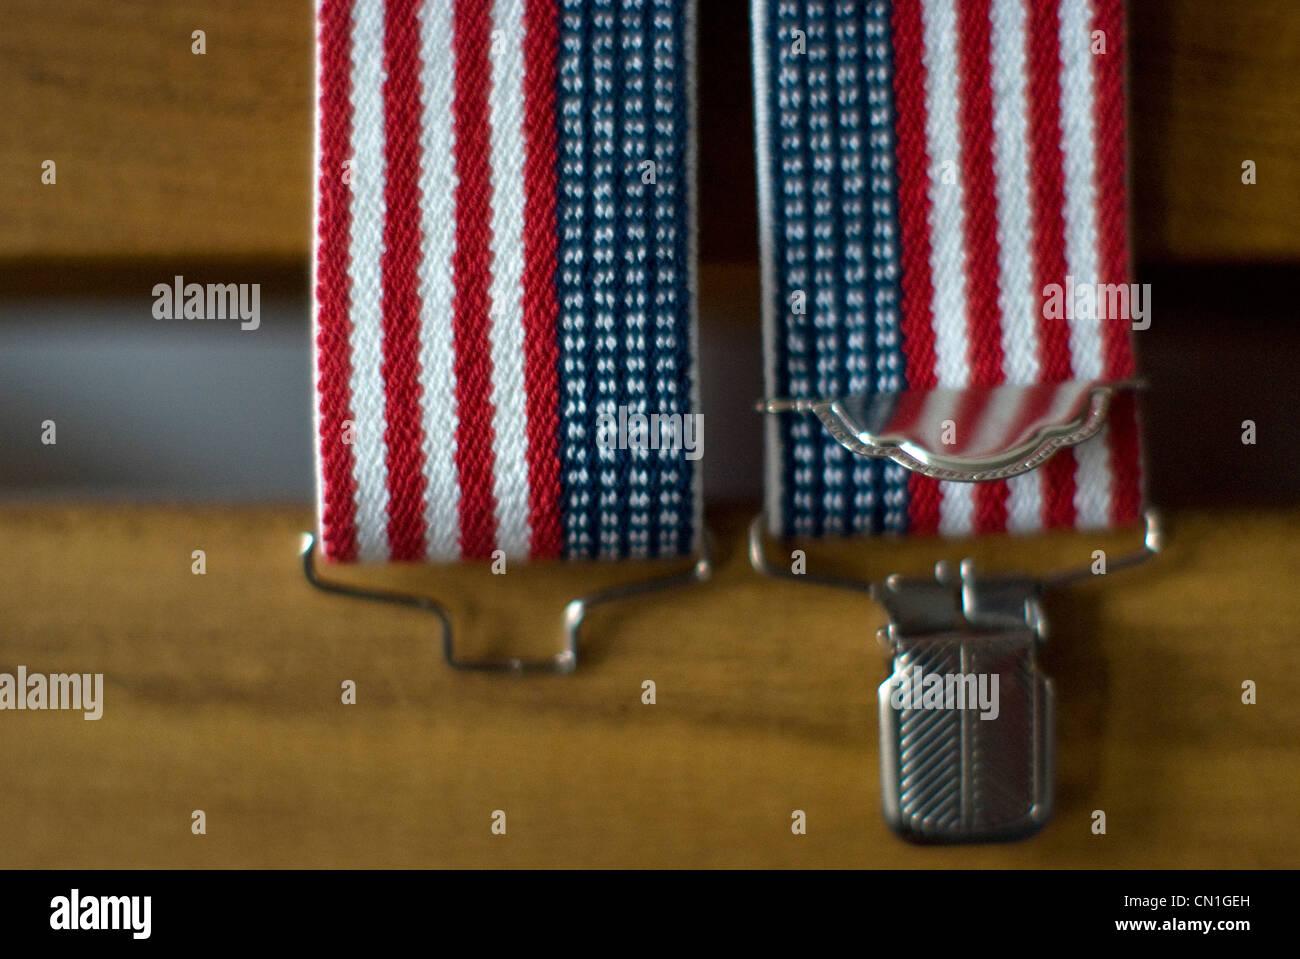 Detail of American Flag Suspenders - Stock Image